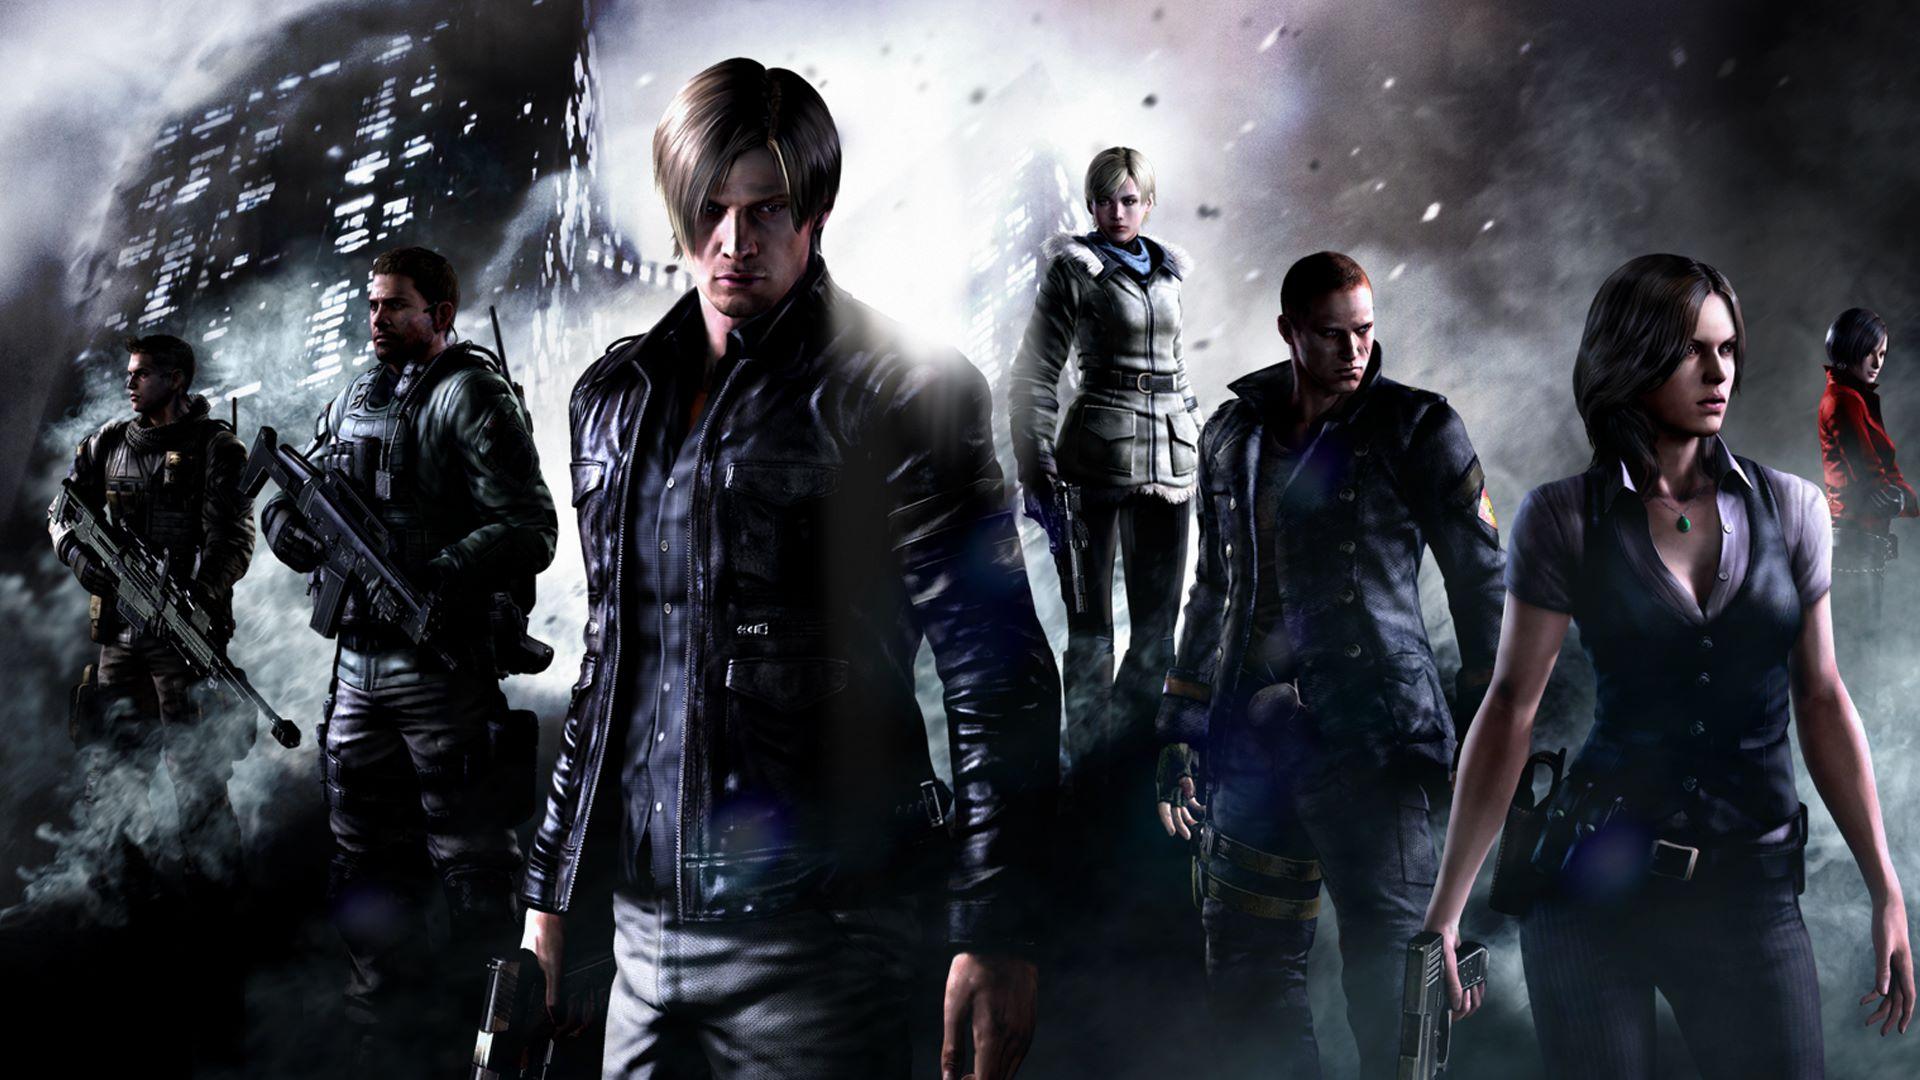 Buy Resident Evil 6 Microsoft Store Revelations Ps4 Region 3 English